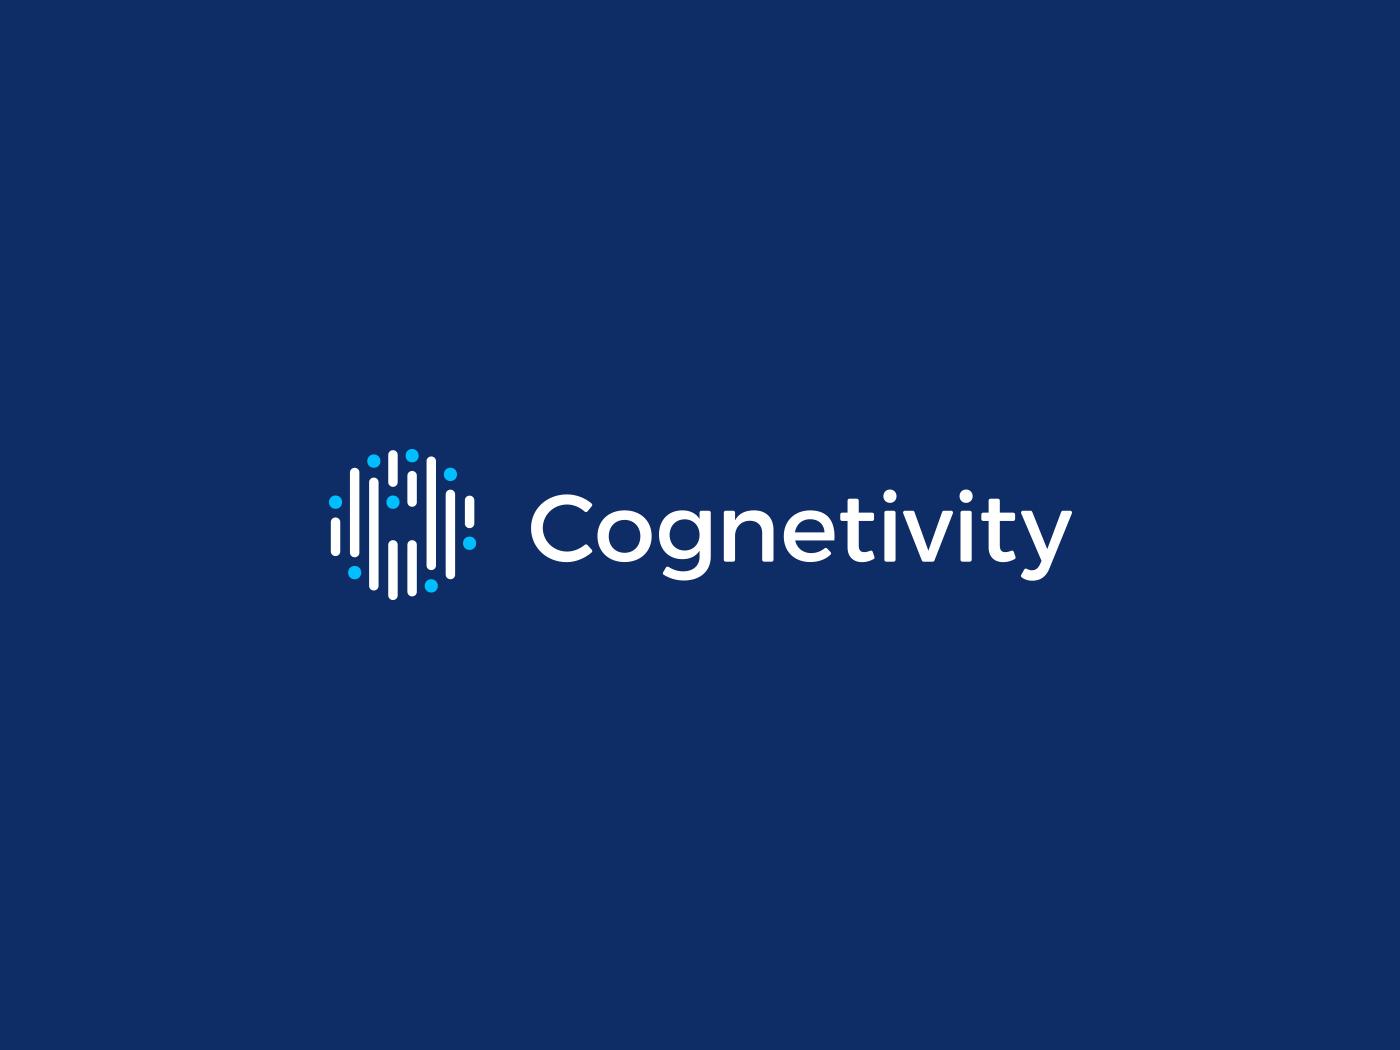 Cognetivity secondary logo, colour reversed